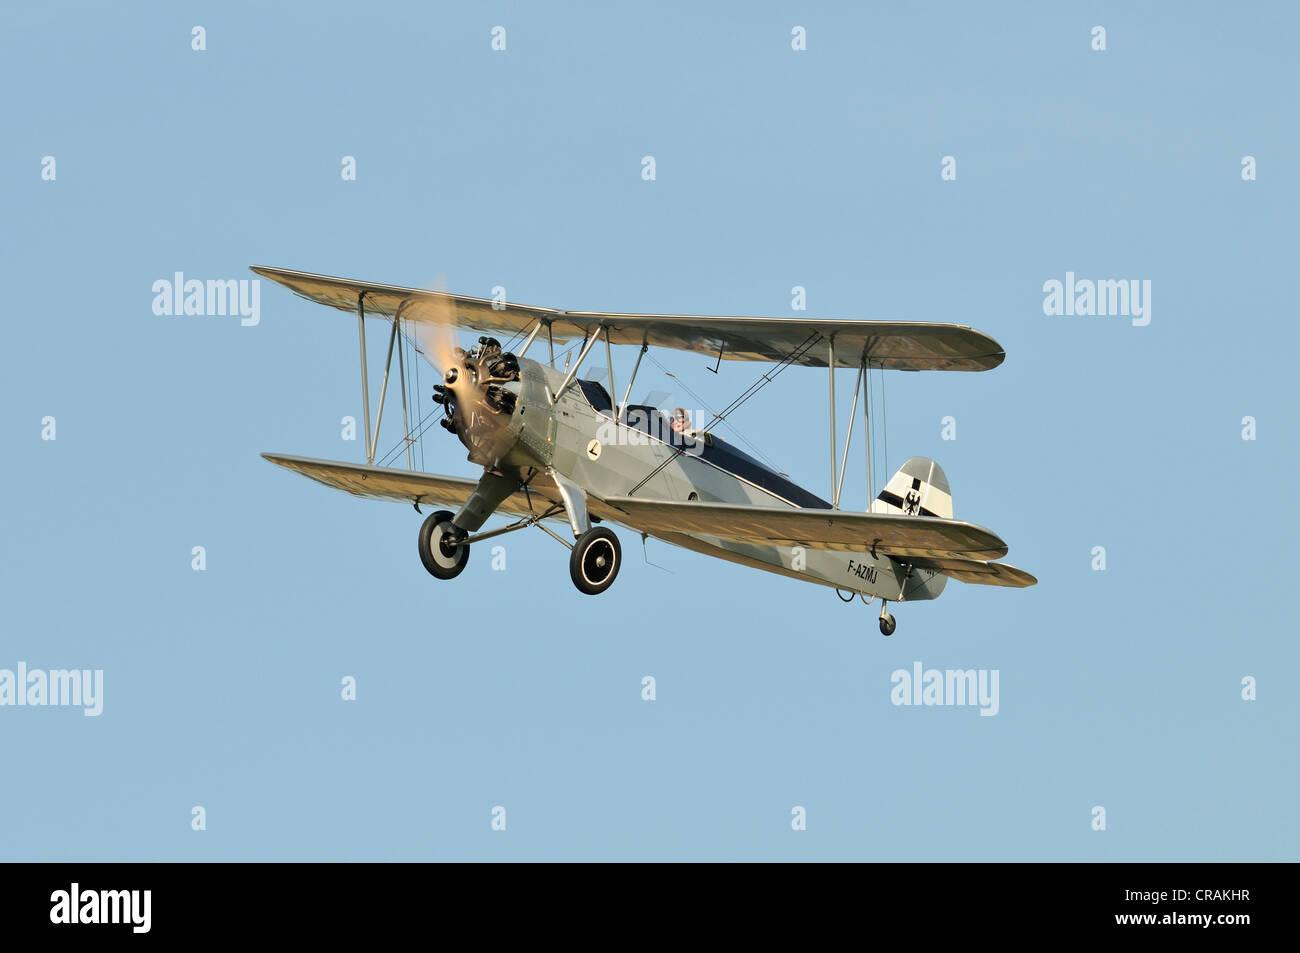 German Focke-Wulf FW-44 Stieglitz biplane, first flight in 1932, Europe's largest meeting of vintage aircraft - Stock Image